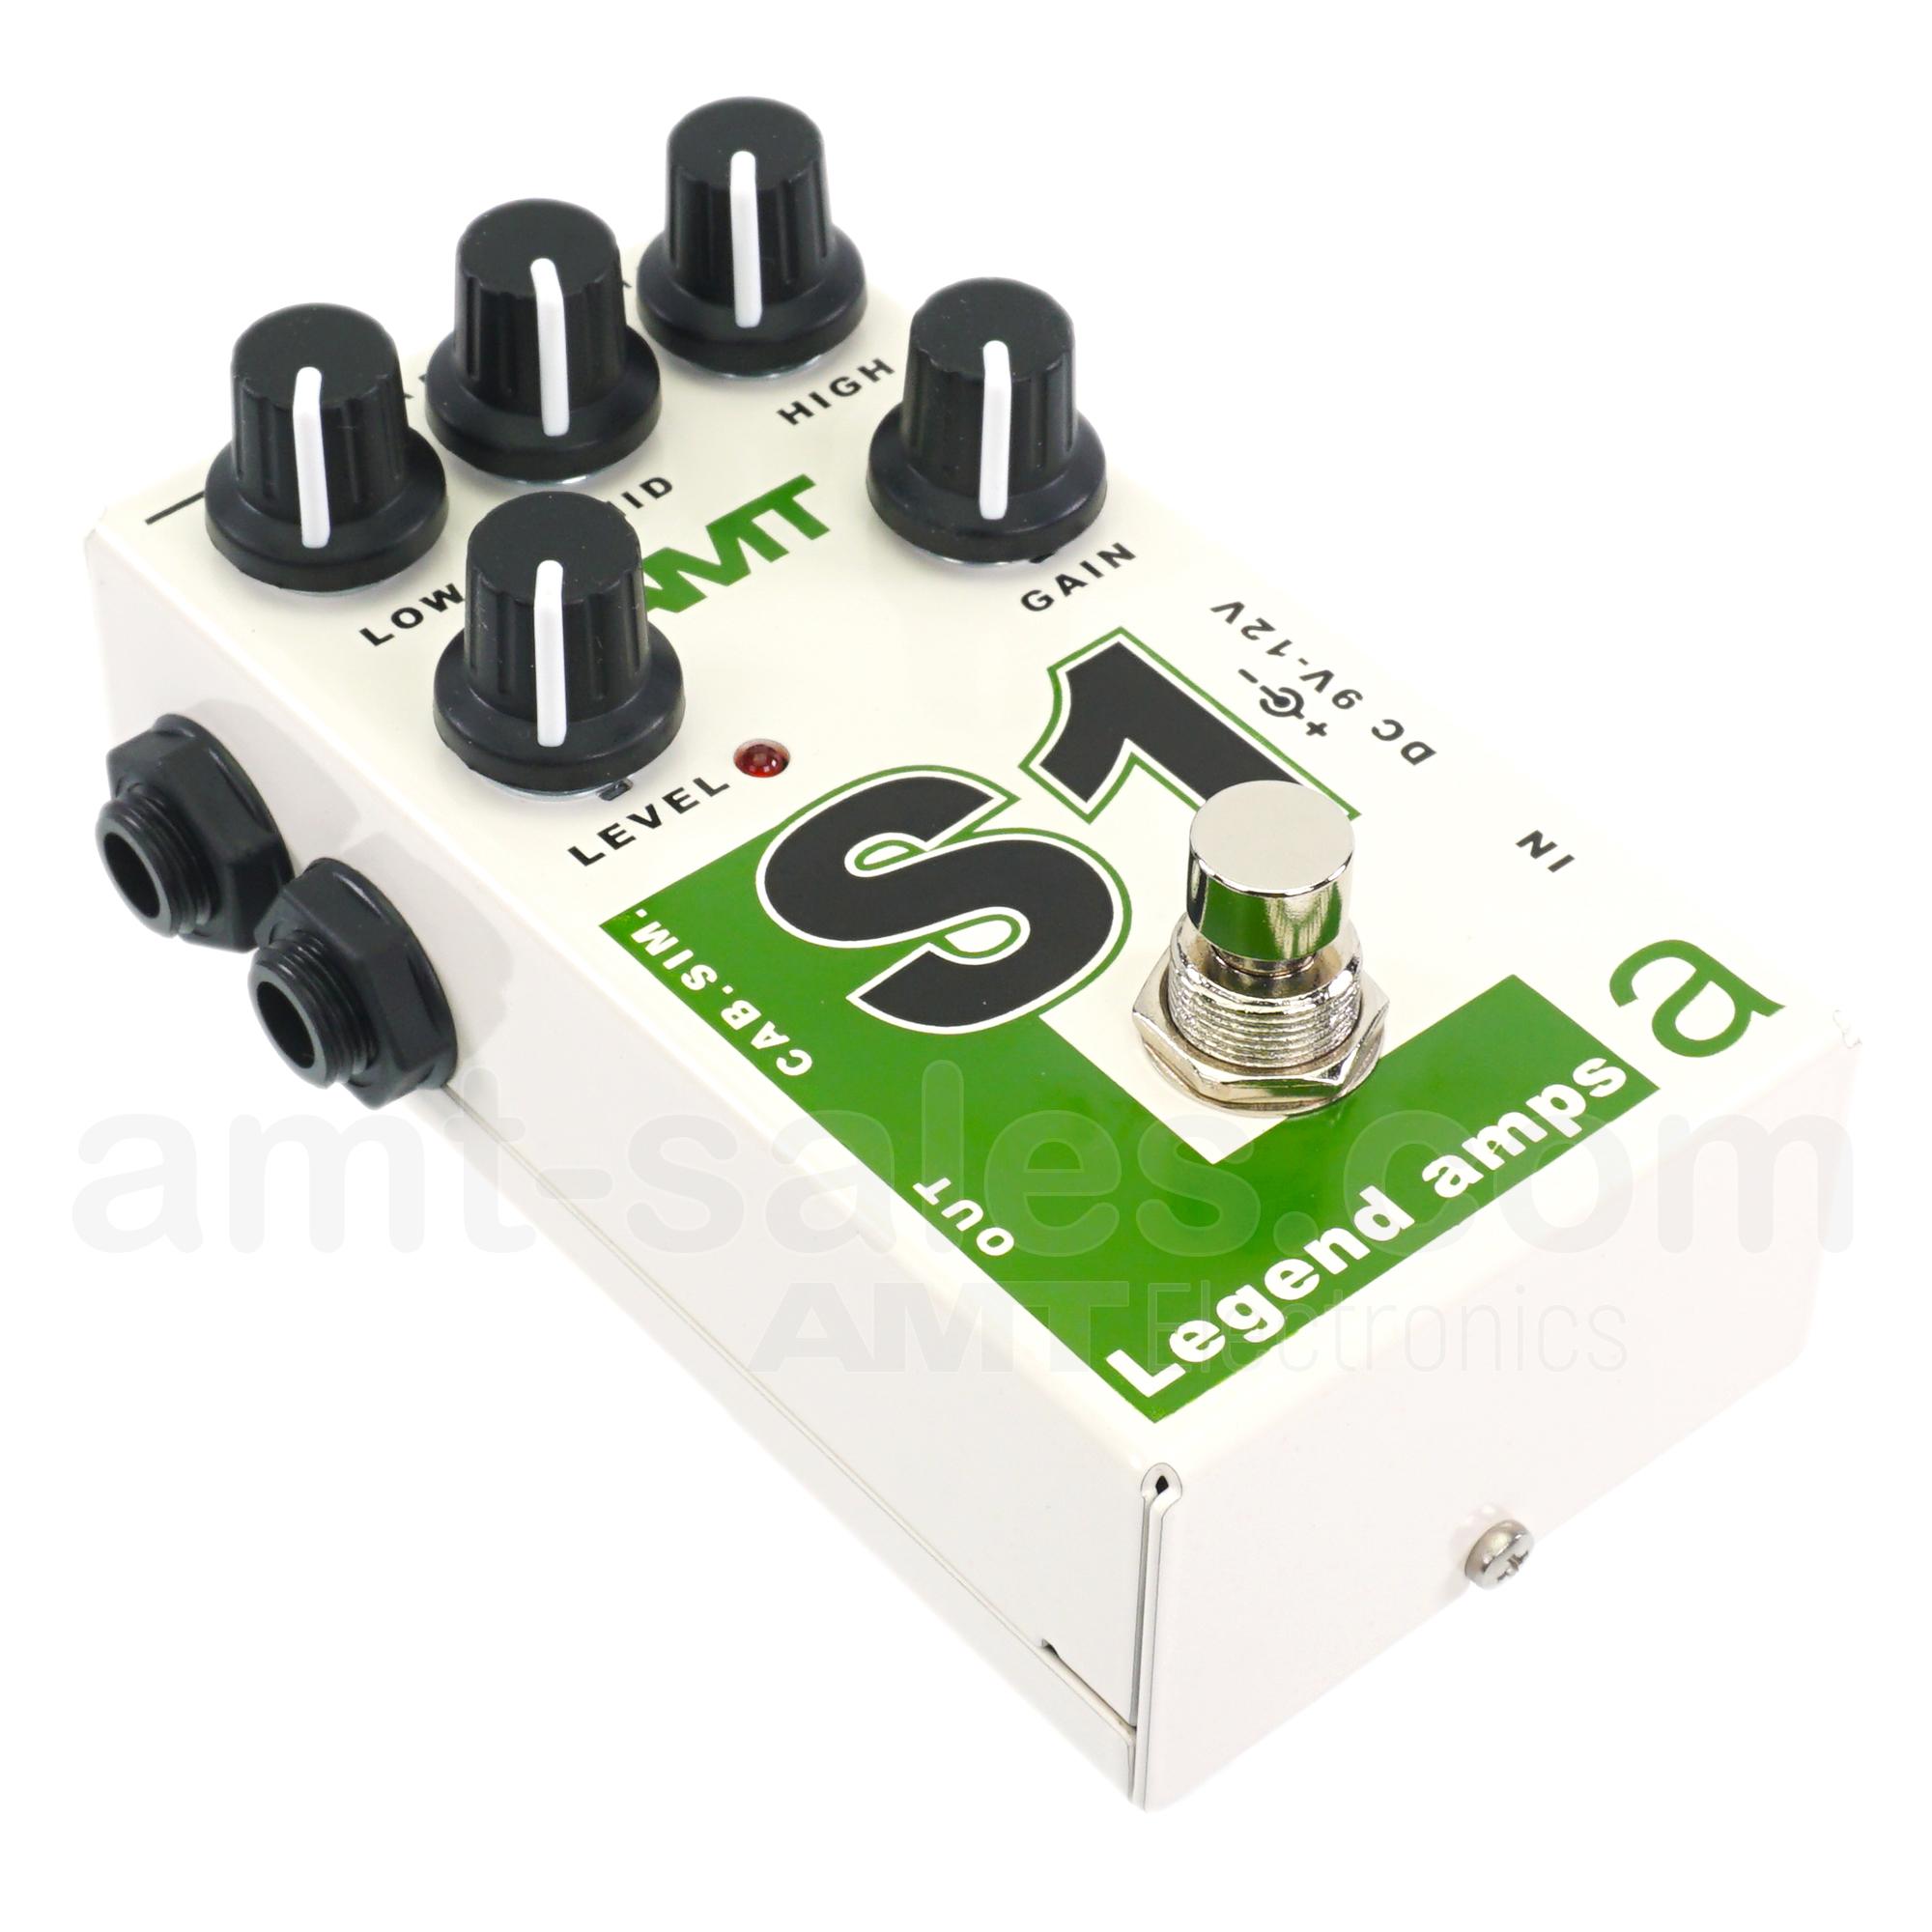 AMT S1 - JFET guitar preamp (1 channel) Soldano